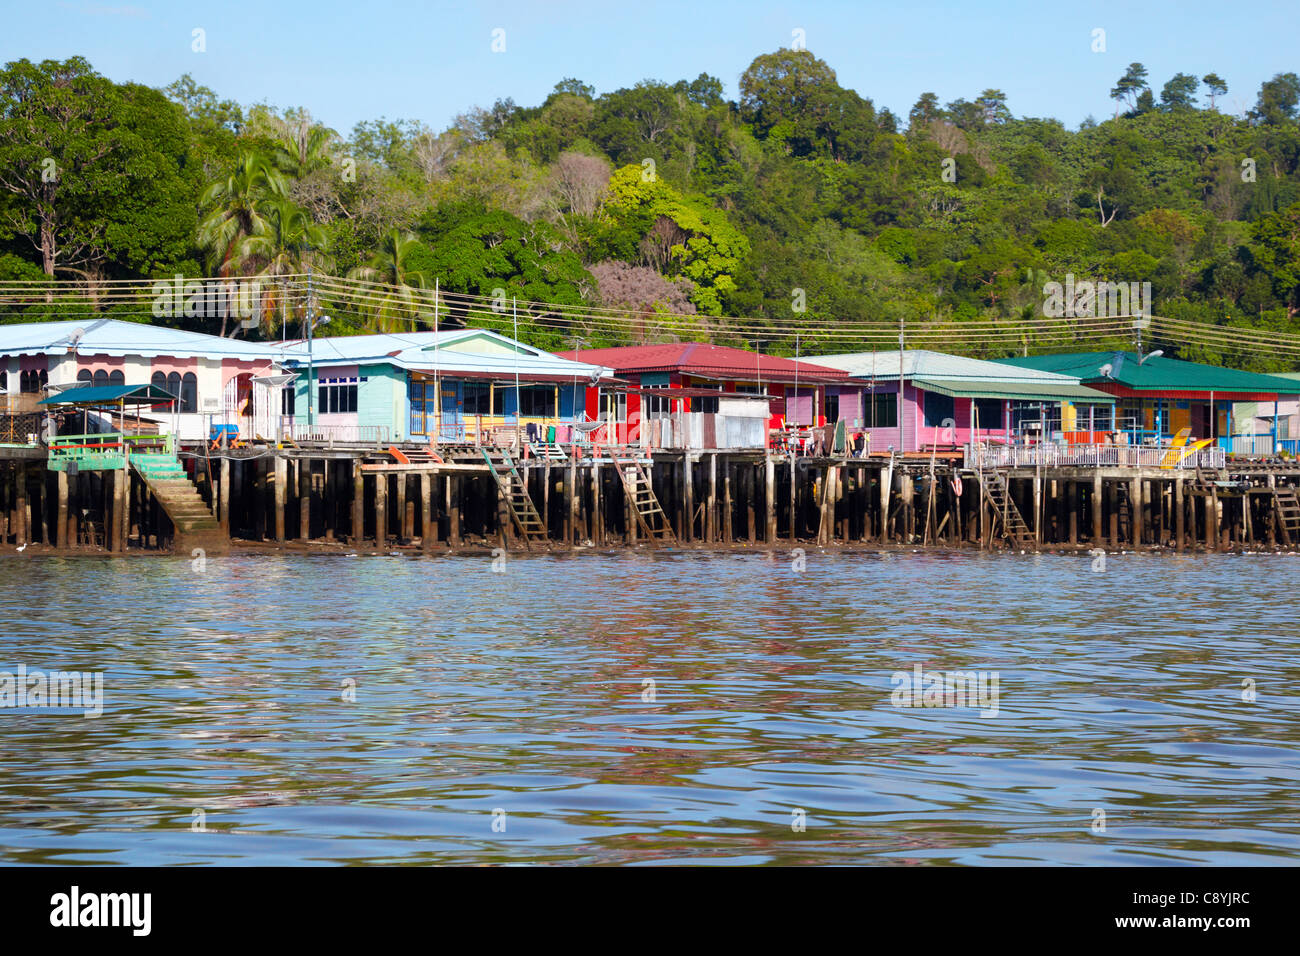 Kampung Ayer, Bandar Seri Begawan, Brunei Darussalam, Asia - Stock Image